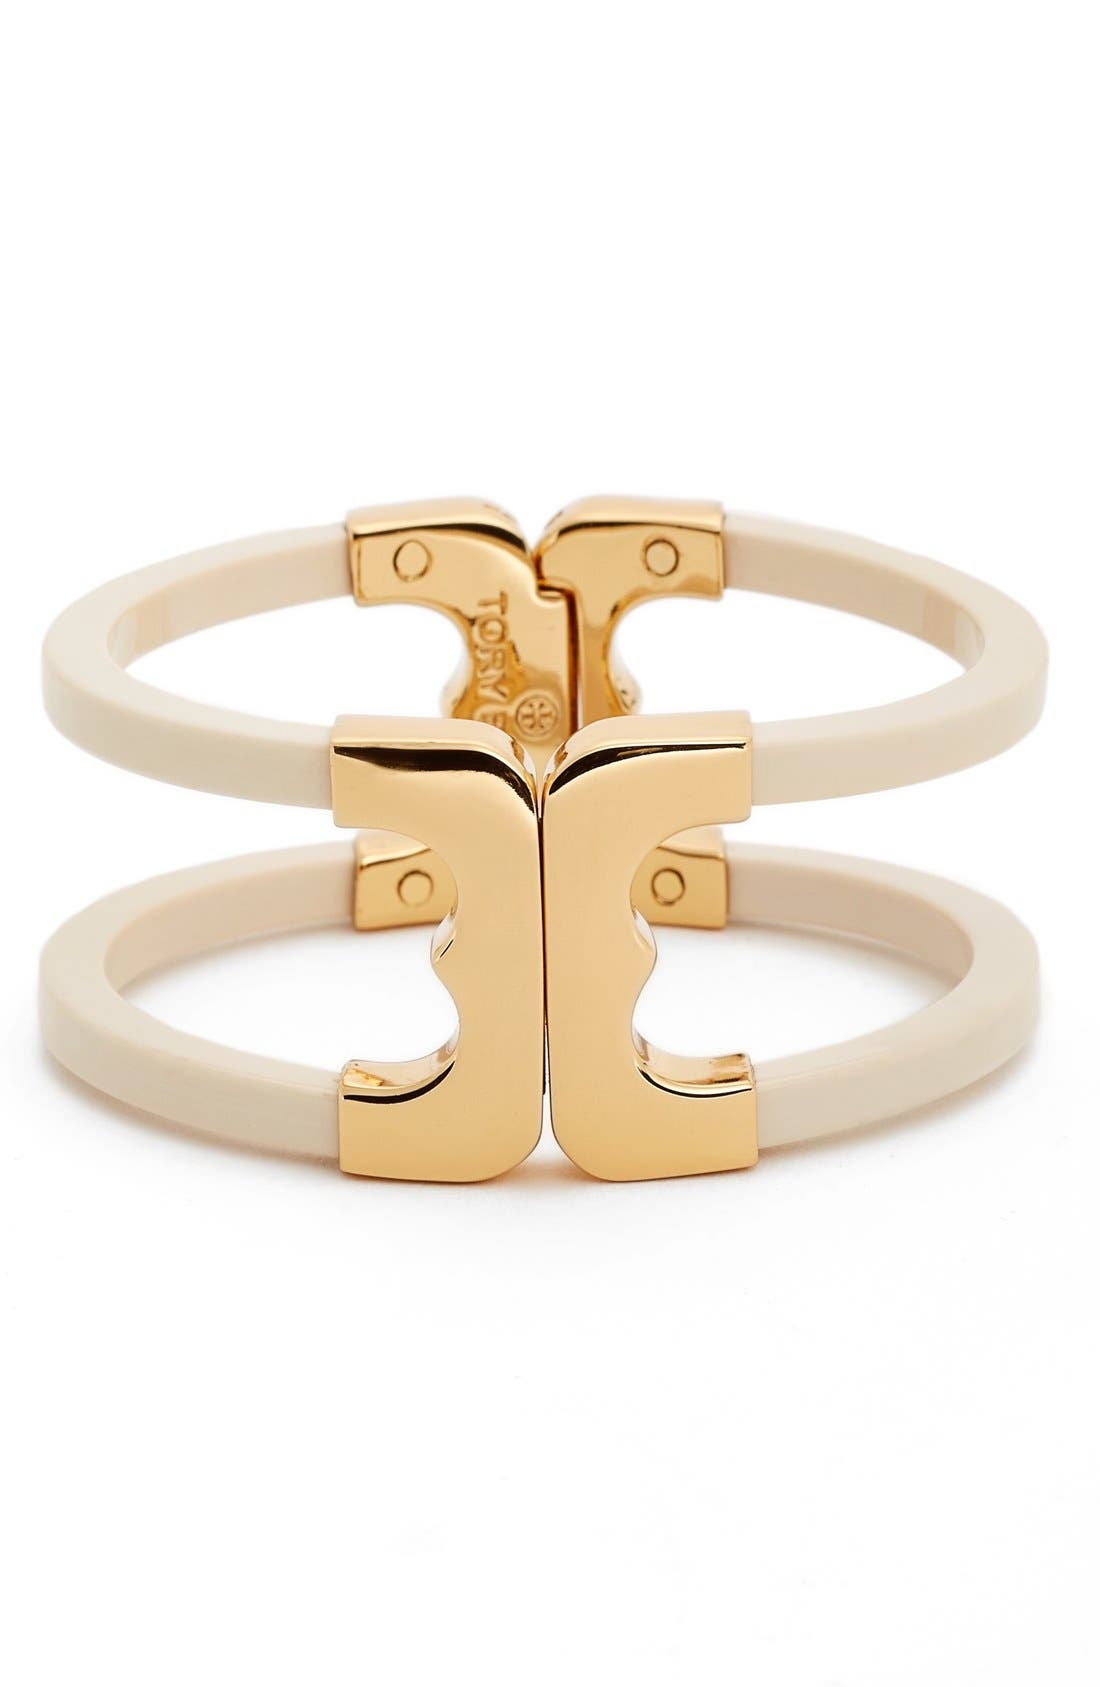 Tory Burch 'Gemini' Openwork Bracelet